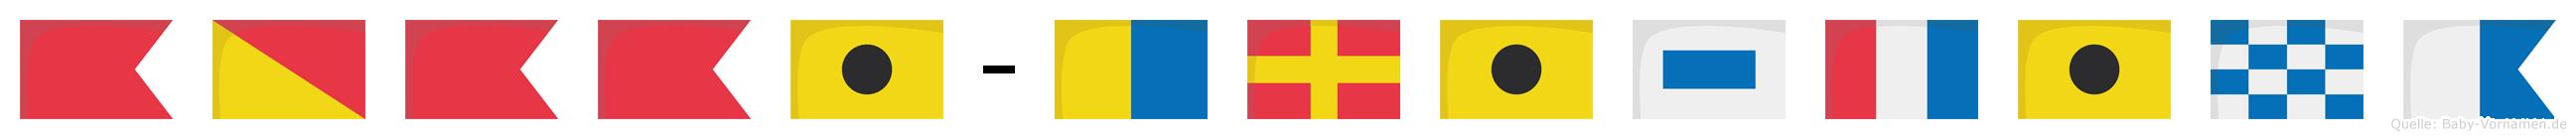 Bobbi-Kristina im Flaggenalphabet